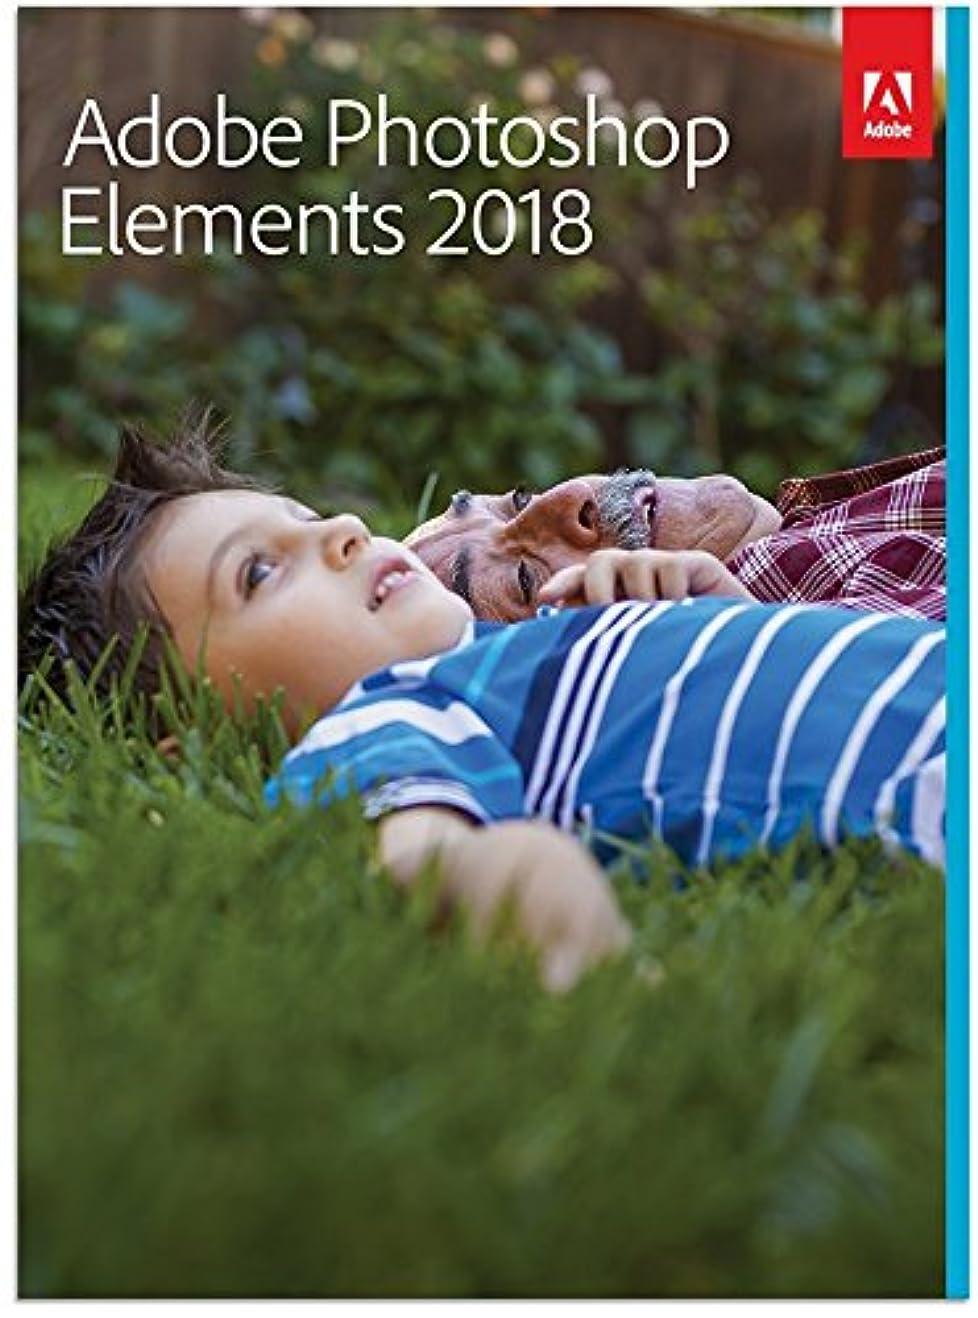 浴室市区町村ブリークAdobe Photoshop Elements 2018 [並行輸入品] (Mac/Windows)